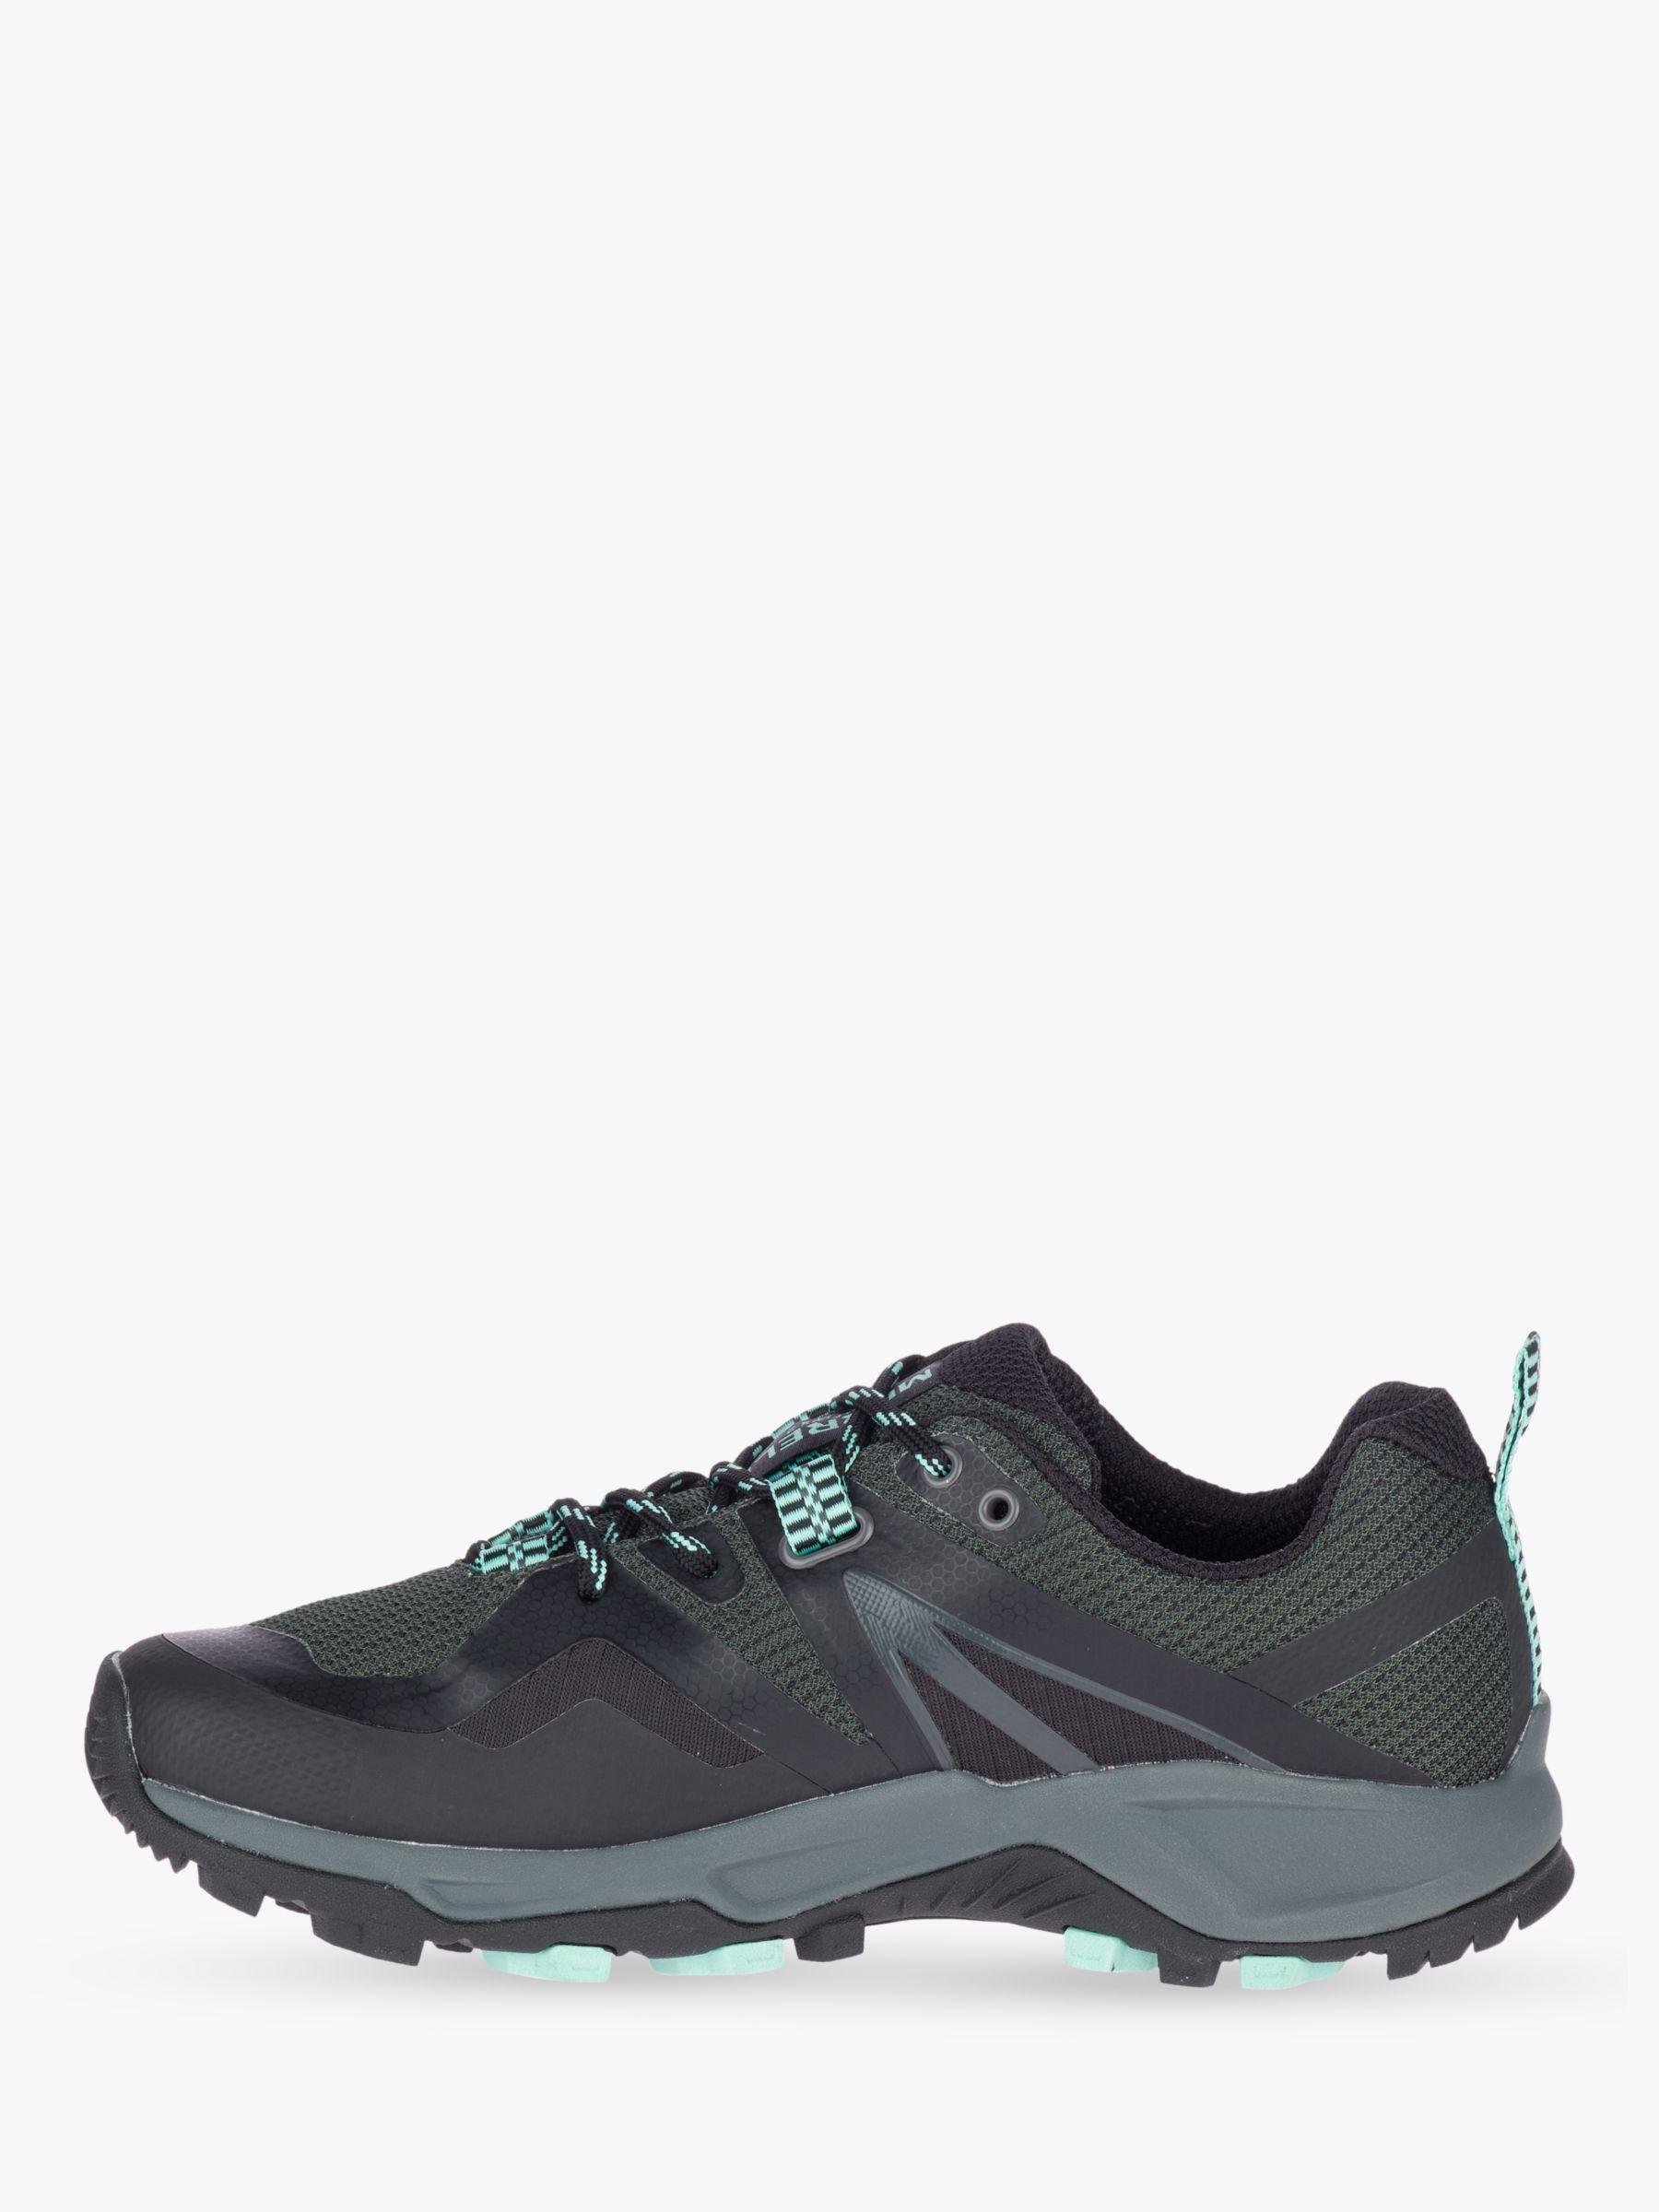 Merrell MQM Flex Women's Waterproof Gore Tex Walking Shoes